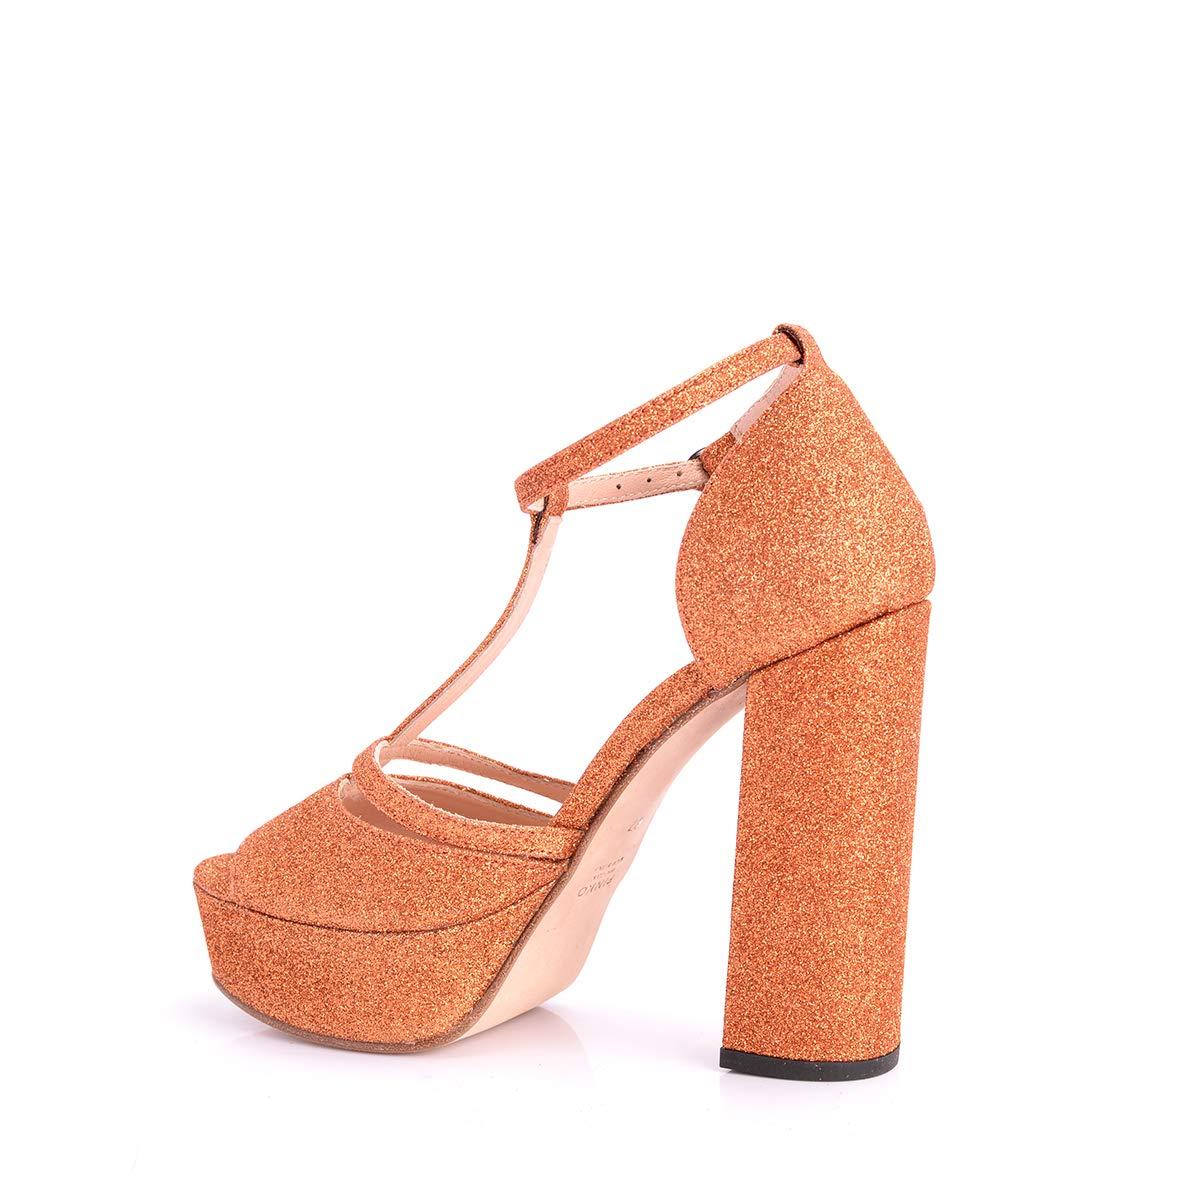 Sandalo 291b3a Bronzo Gamay Glitter Pinko HwXaAH